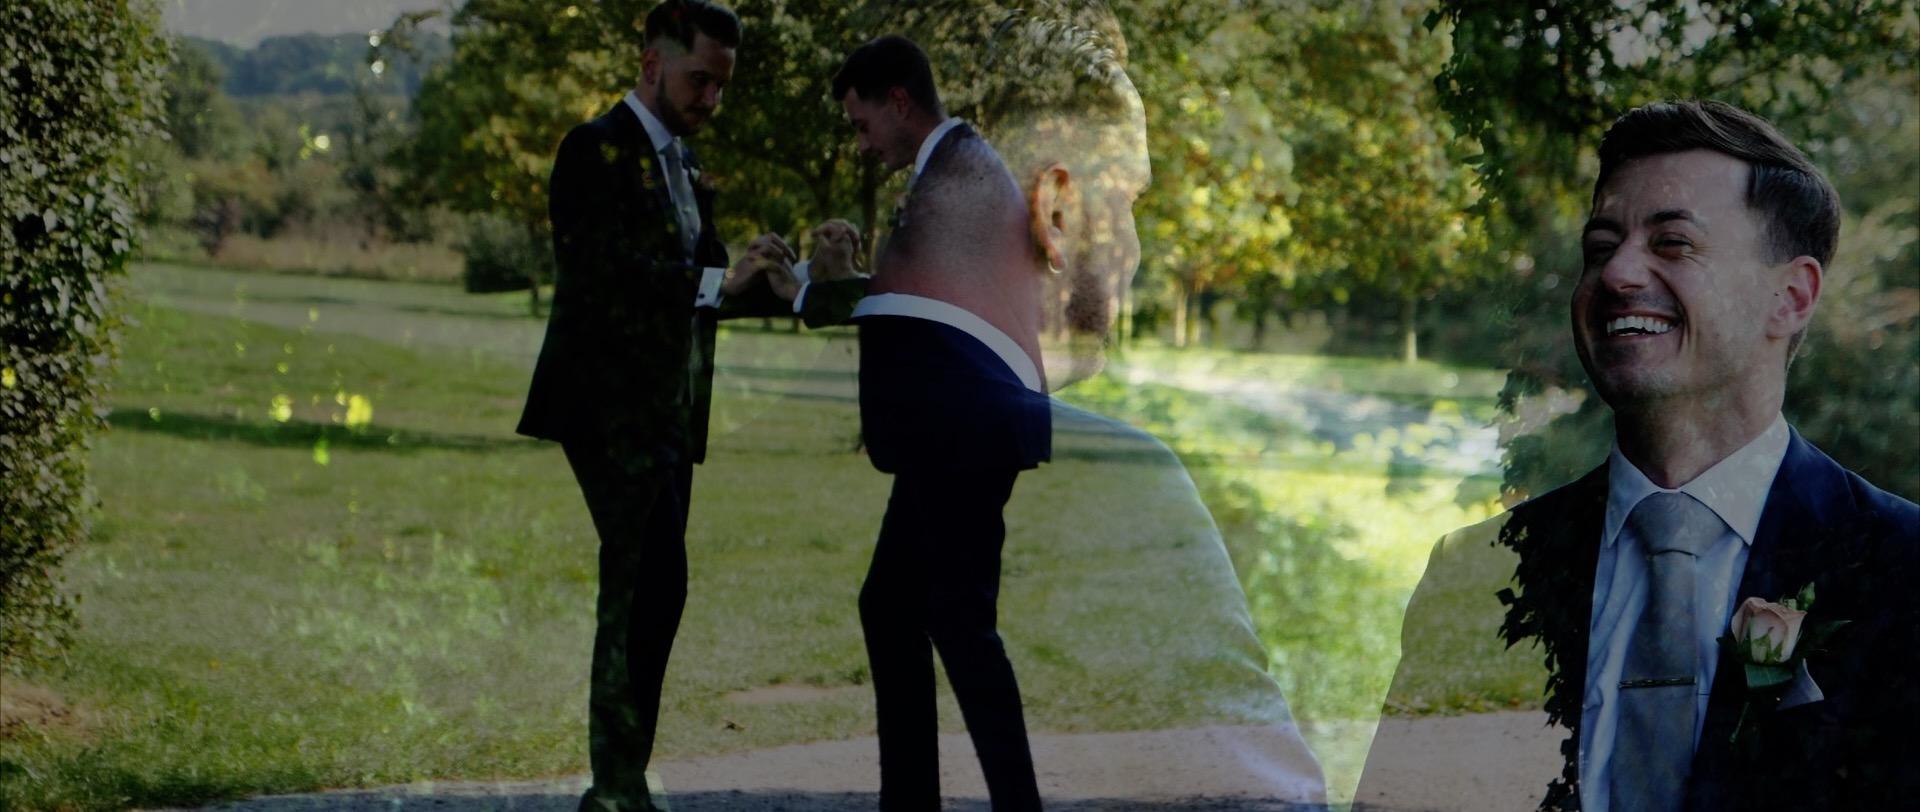 Essex same sex wedding videographer